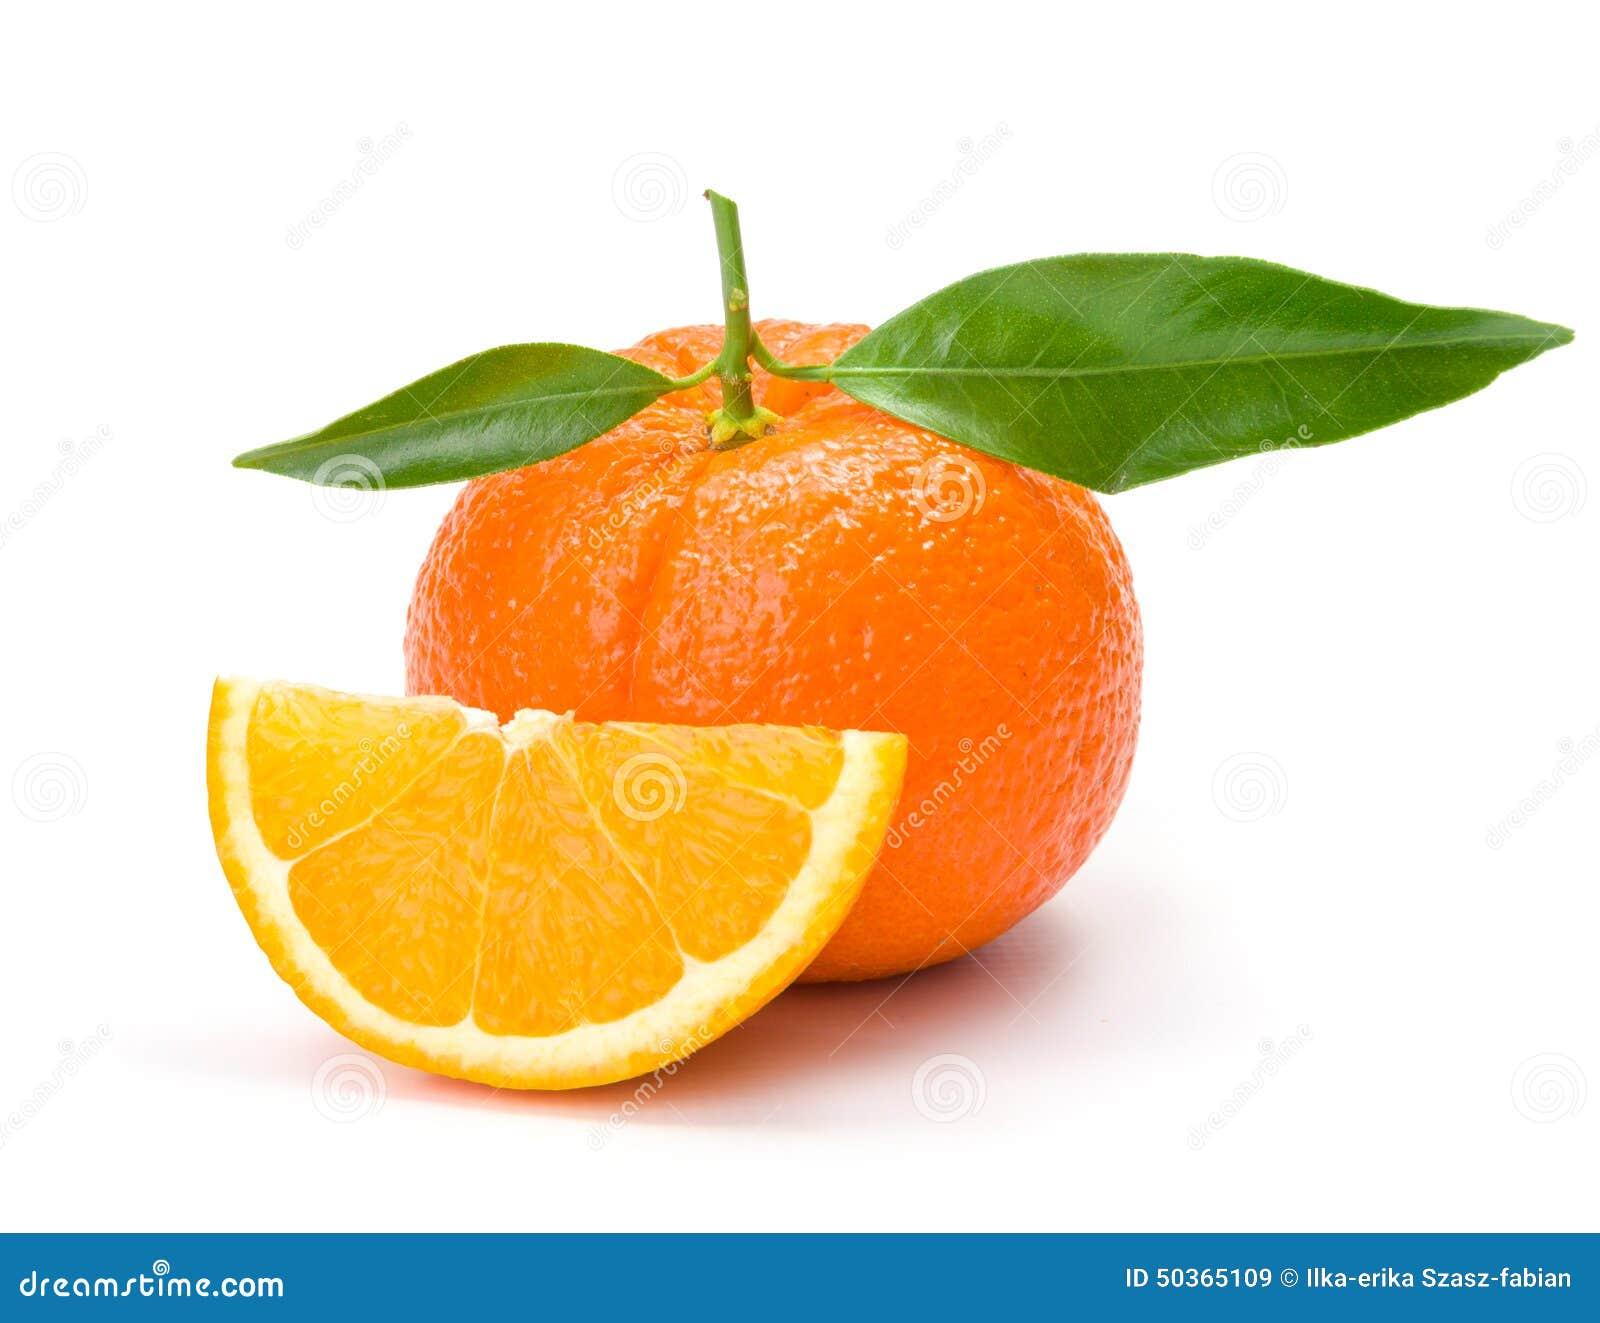 Orange whit slice and leaves